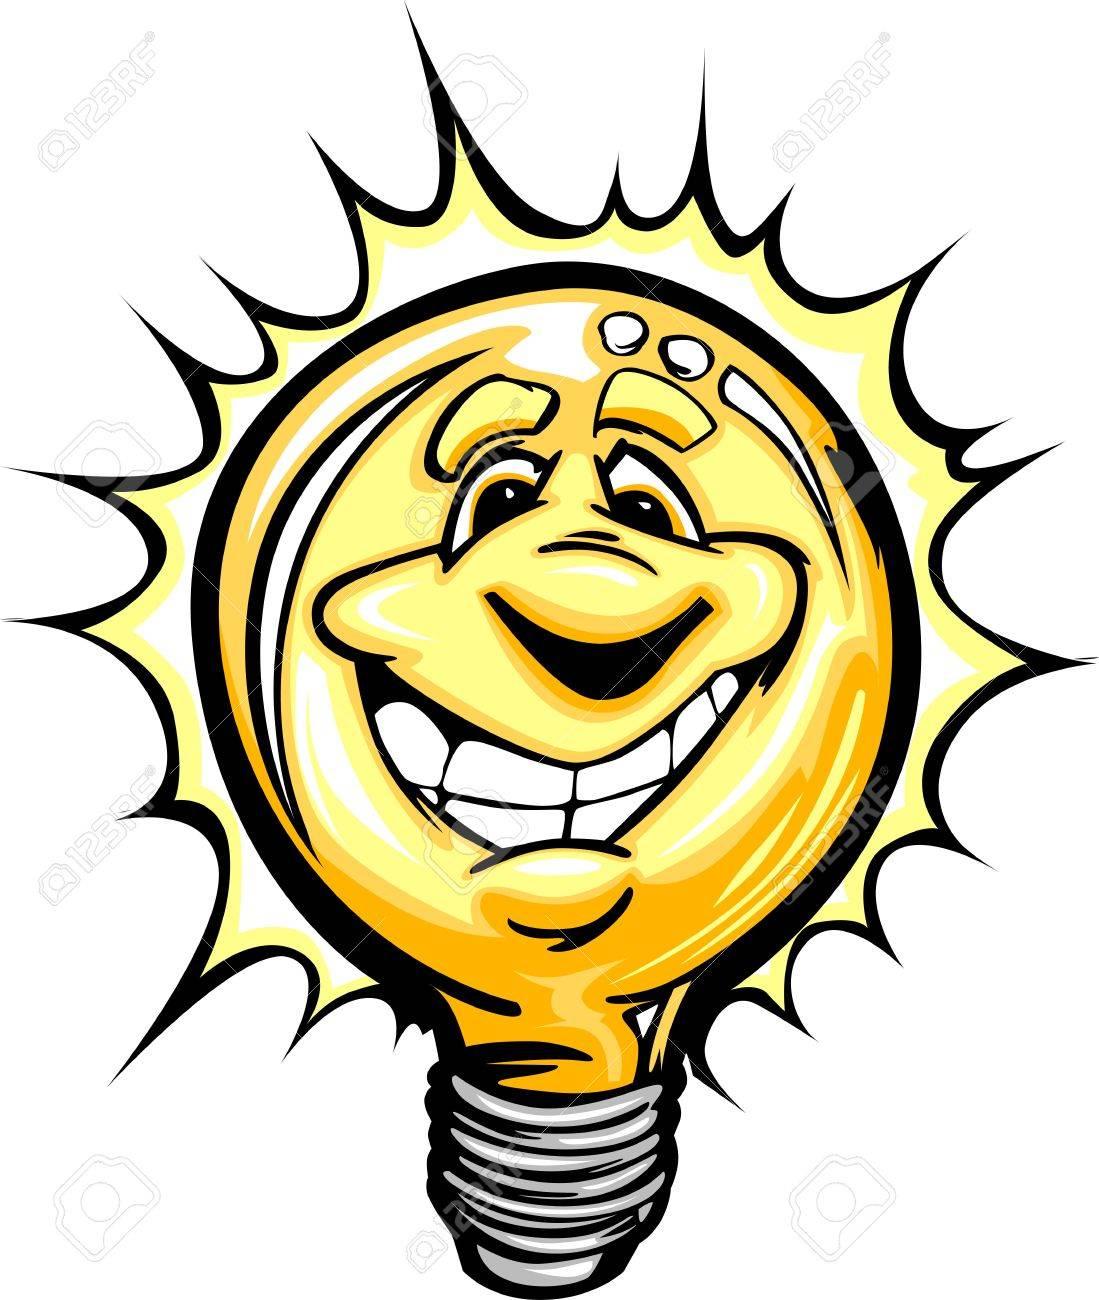 Cartoon Light Bulb with Smiling Face as though having a good idea or energy savings Stock Vector - 14592013